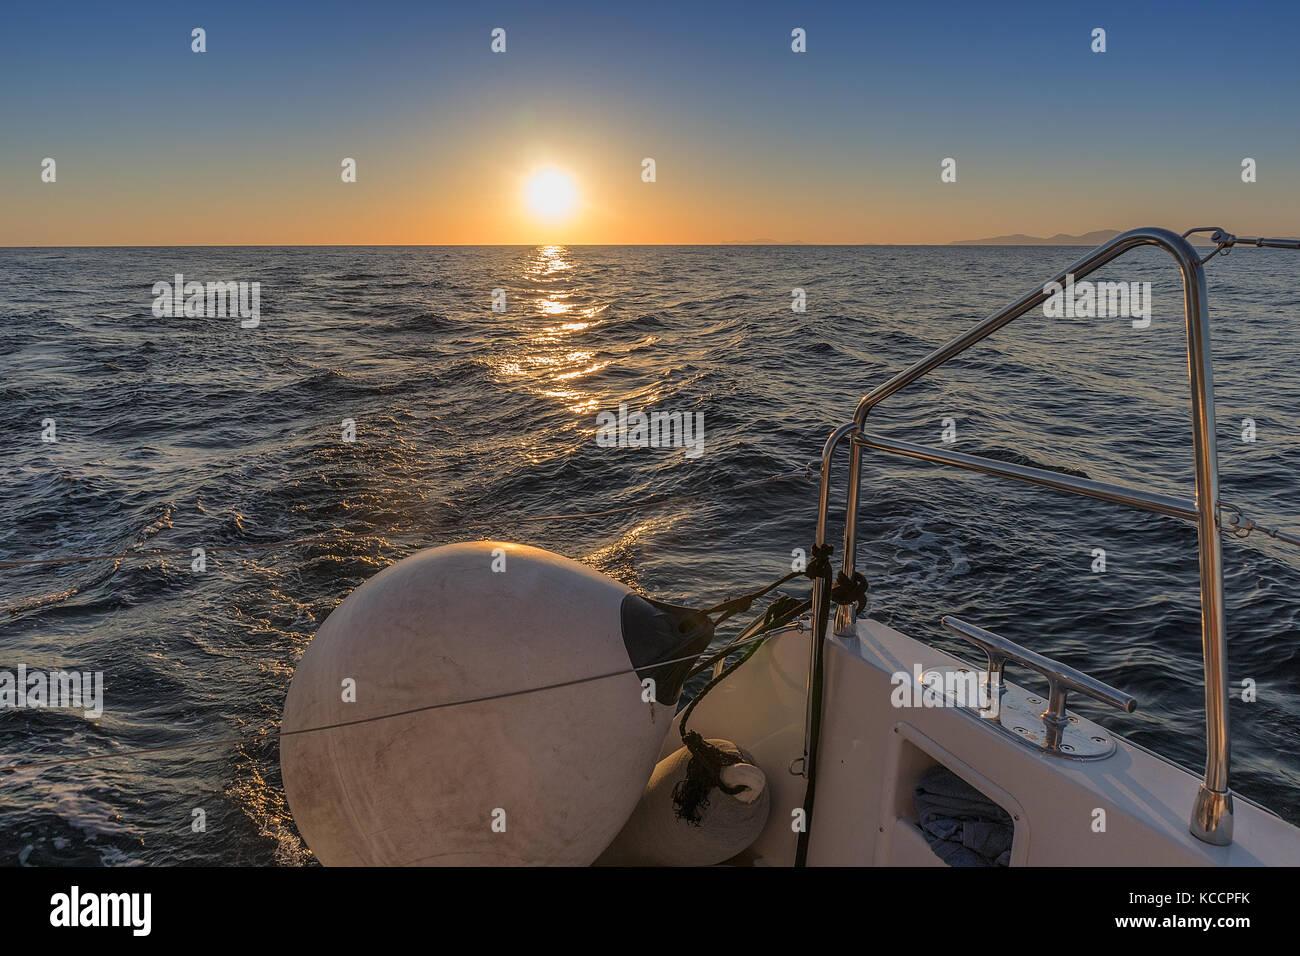 Boat buoy with sunset. Stock Photo